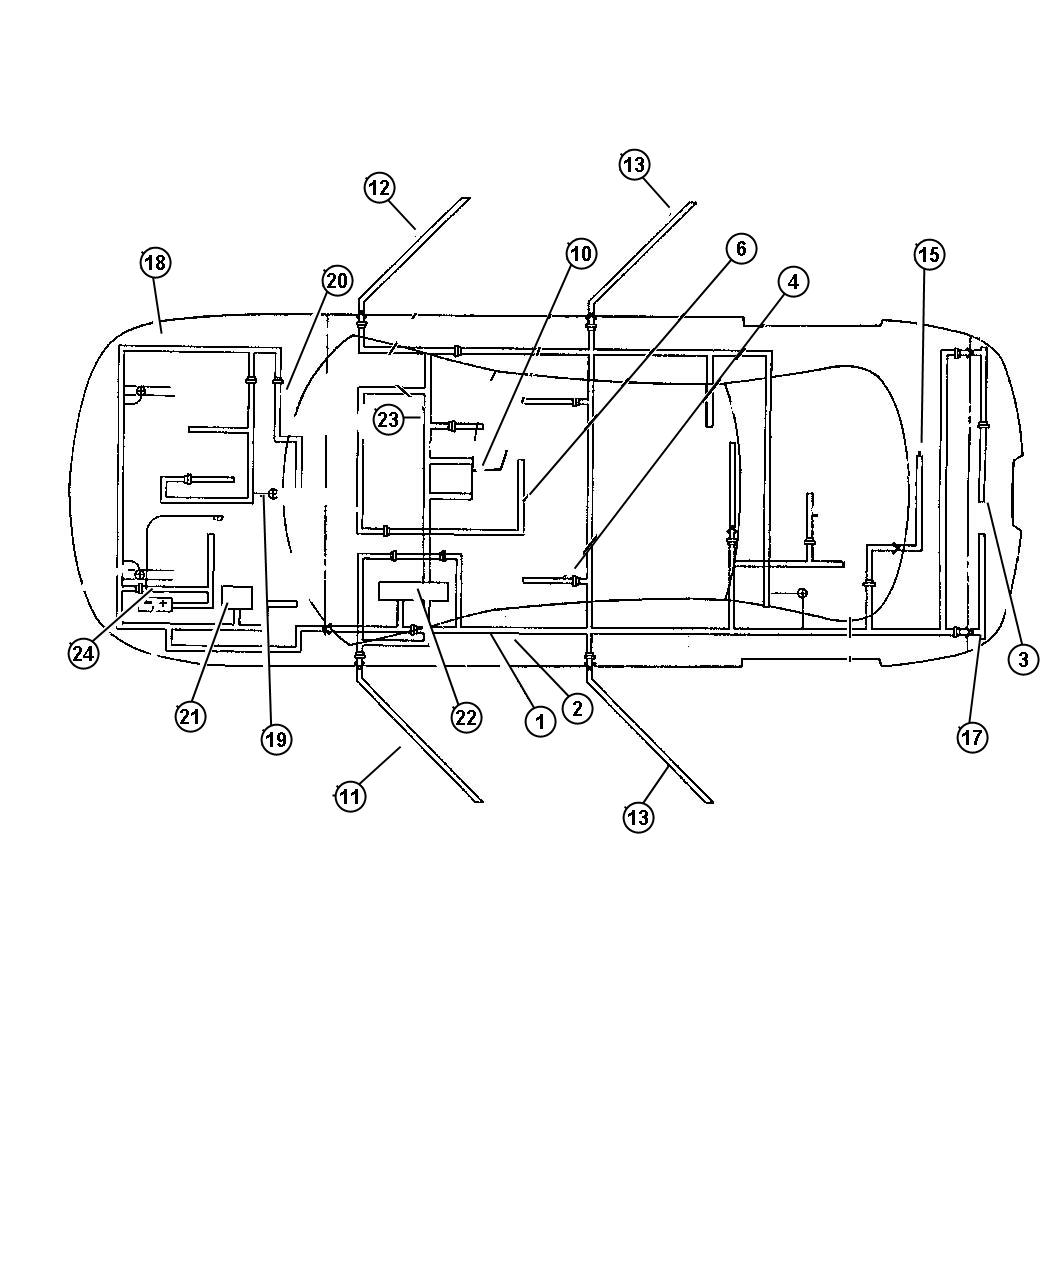 Chrysler 300 Bracket Power Outlet Auxilary Power Harness